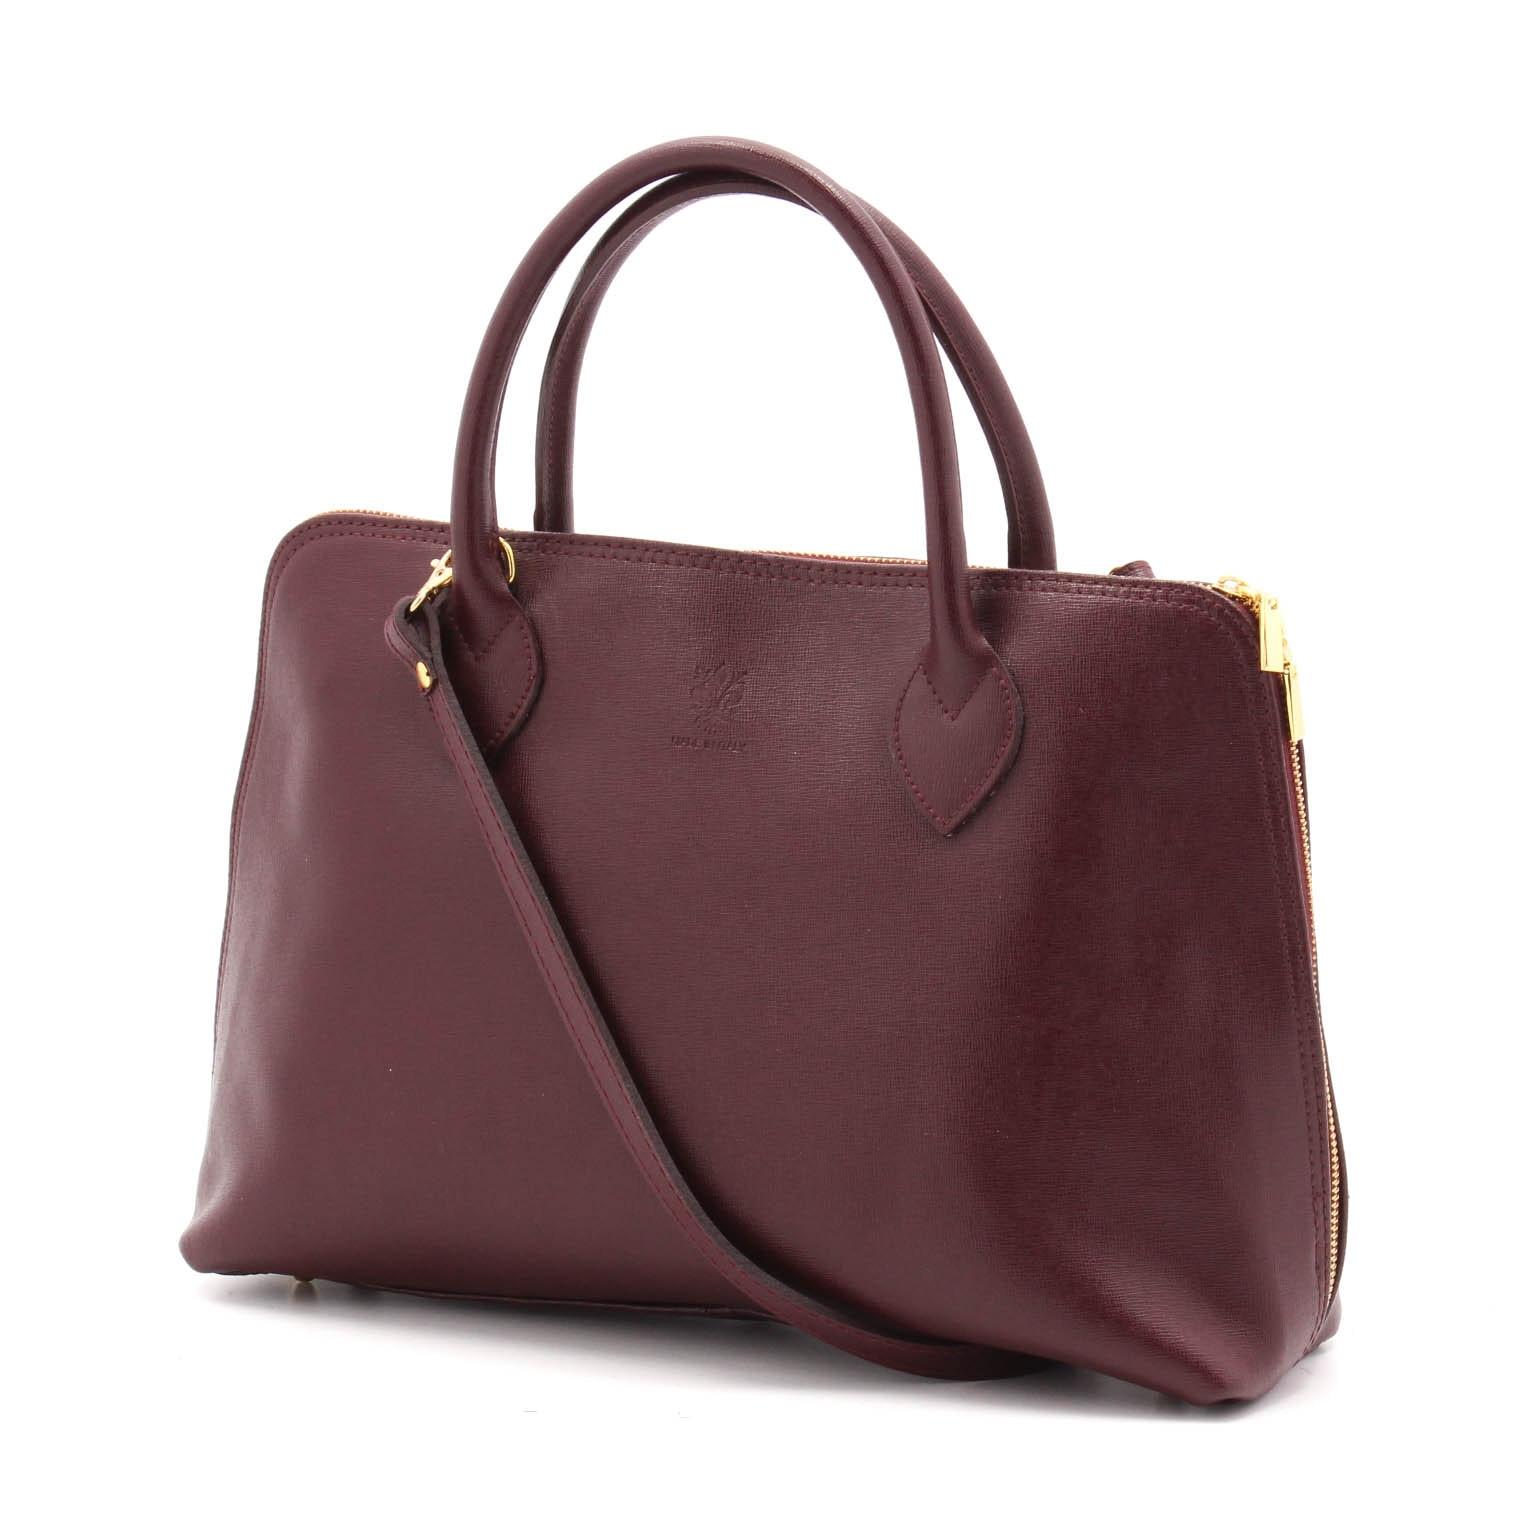 Italian Saffiano Leather Handbag in Merlot